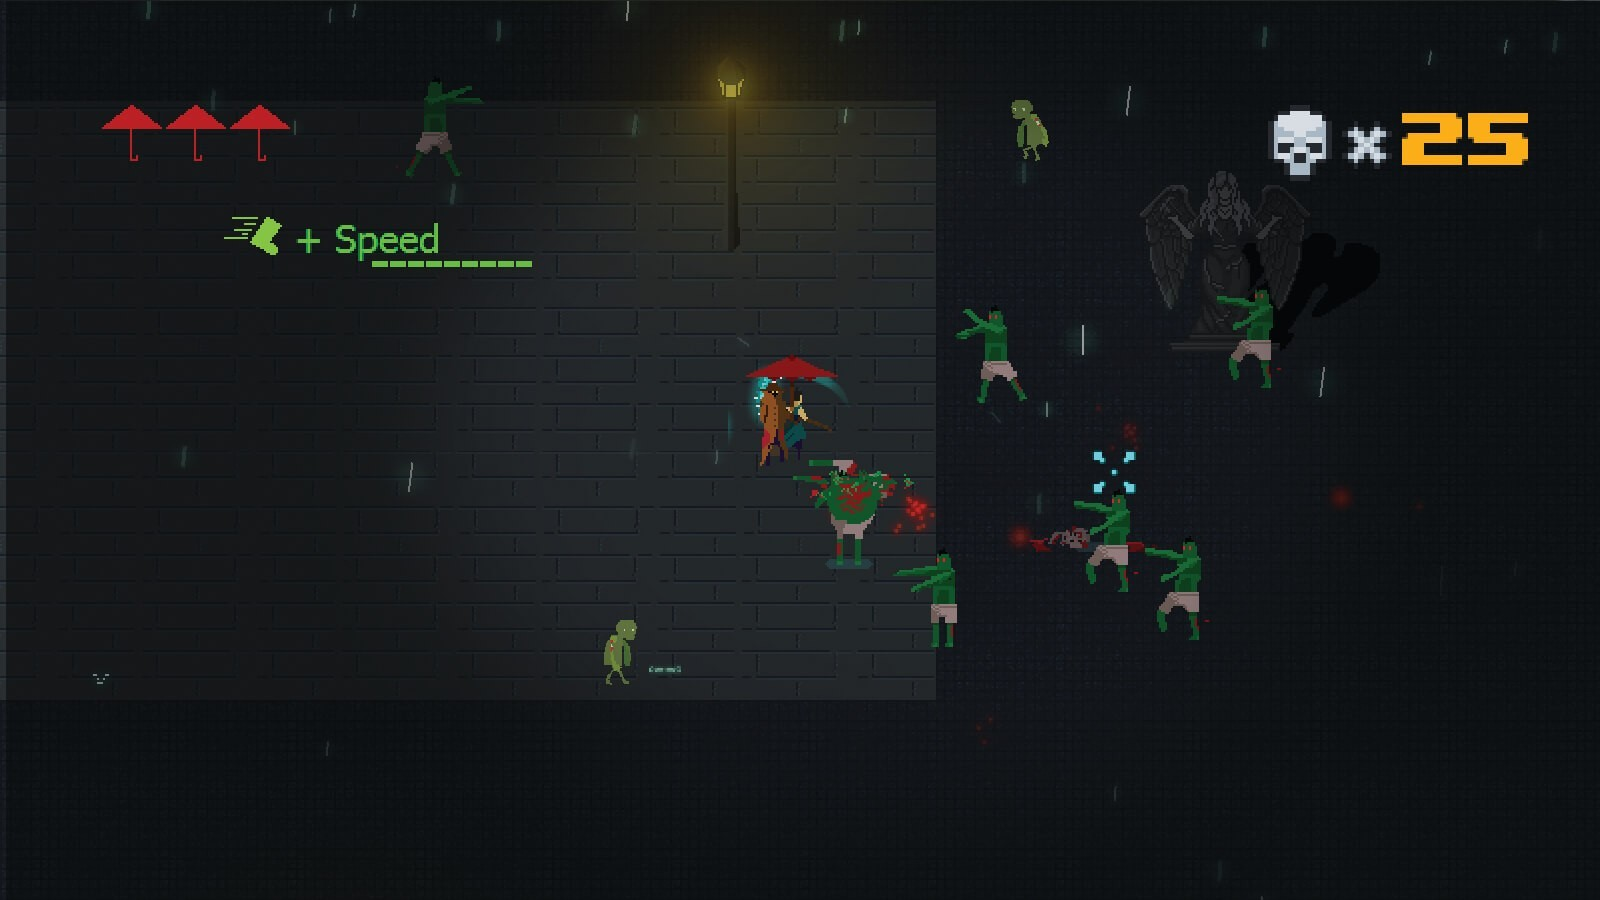 indigo.2014.zombrella.ragemonstergames.ss (2)